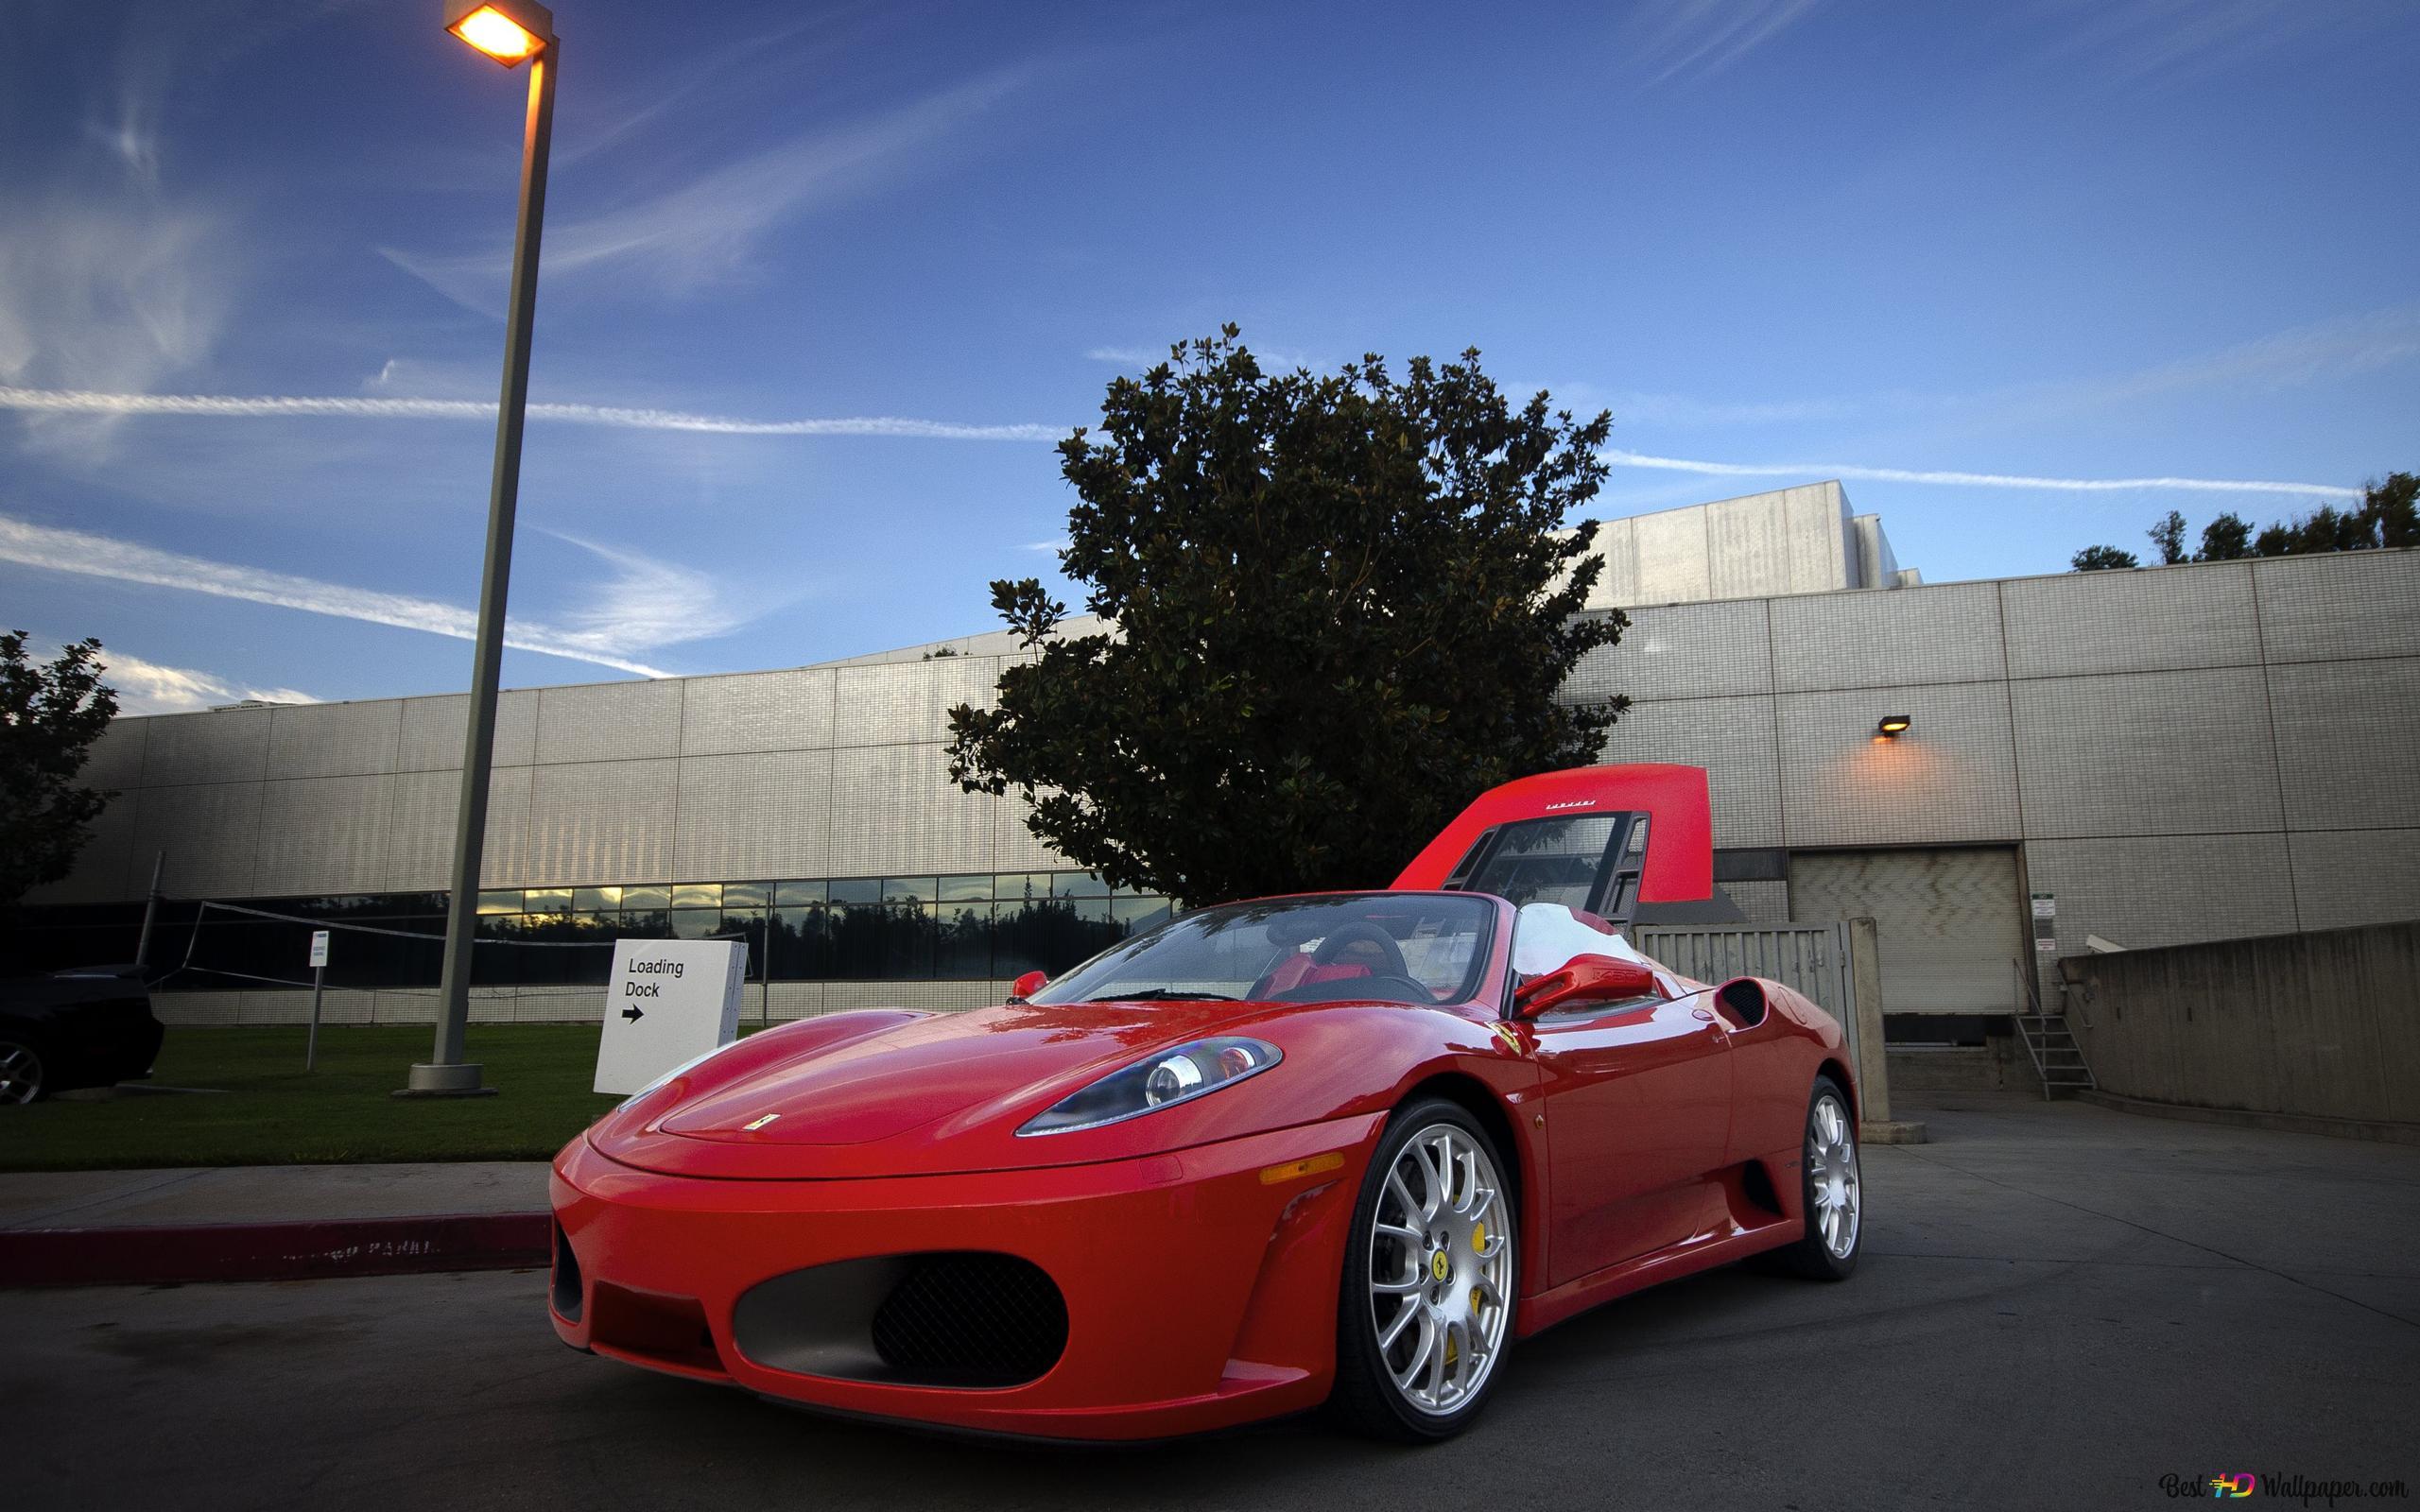 Red Ferrari 458 Hd Wallpaper Download